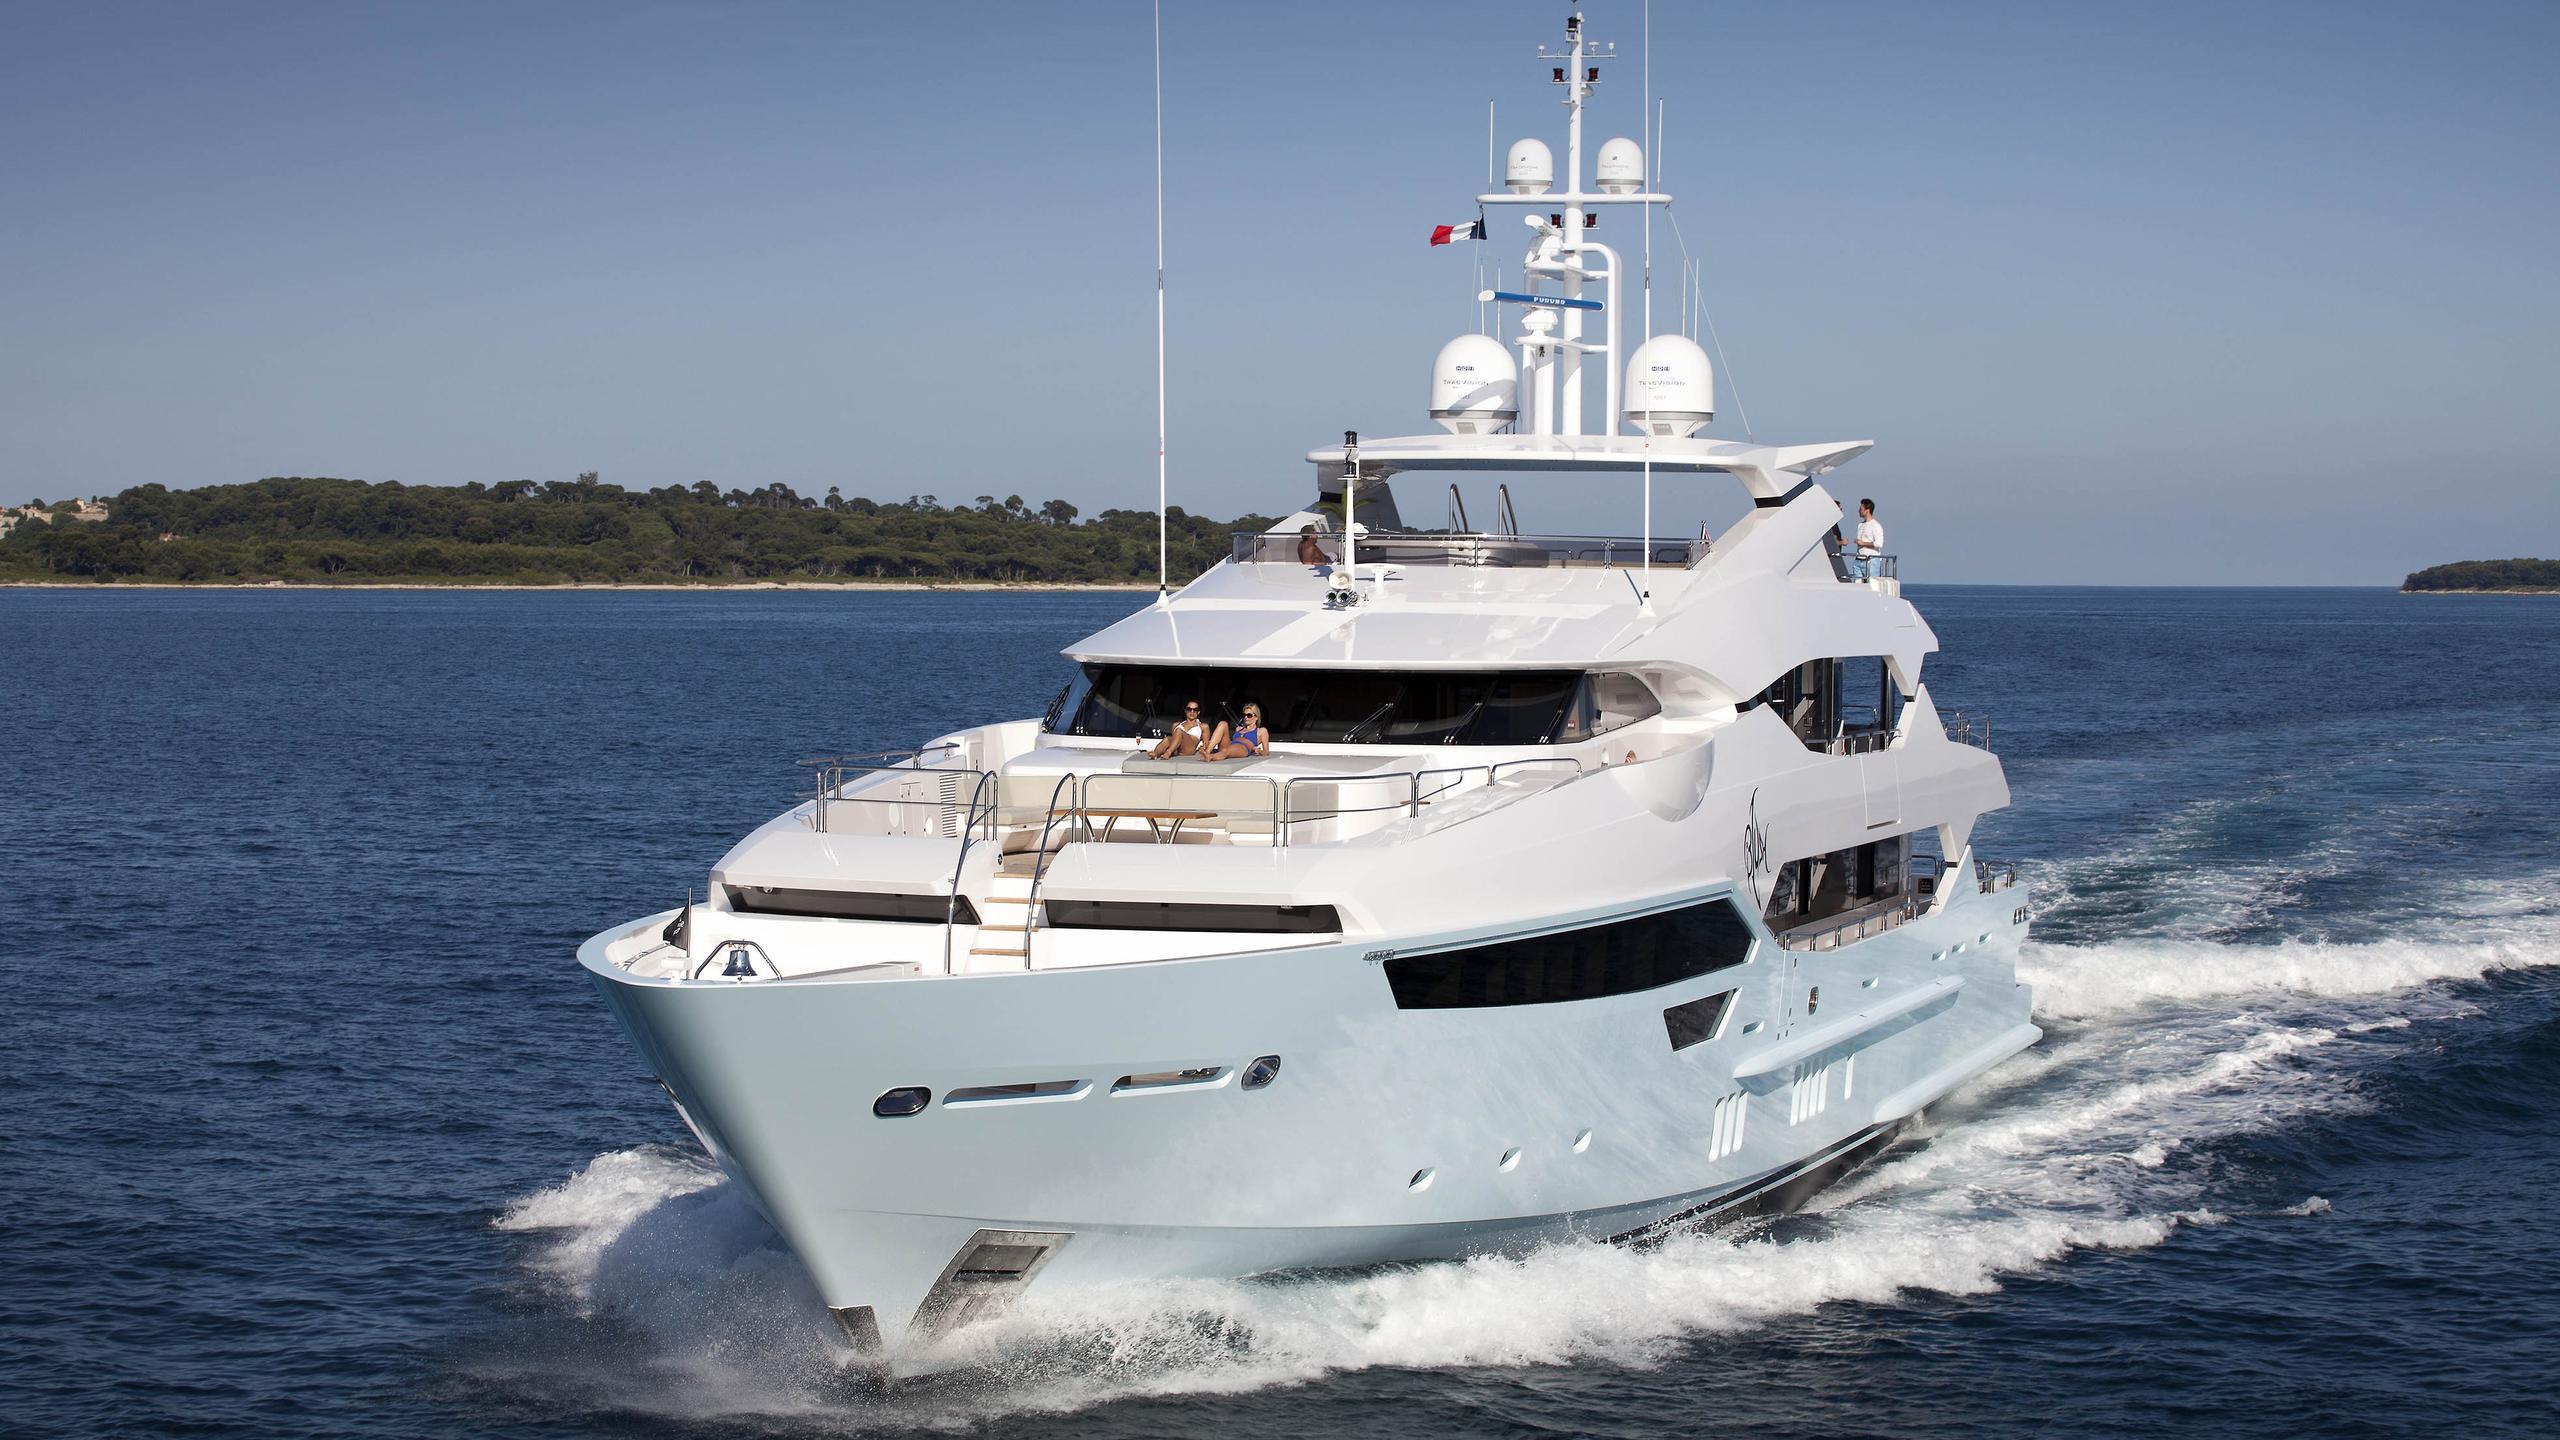 arados-blush-motor-yacht-sunseeker-2014-47m-bow